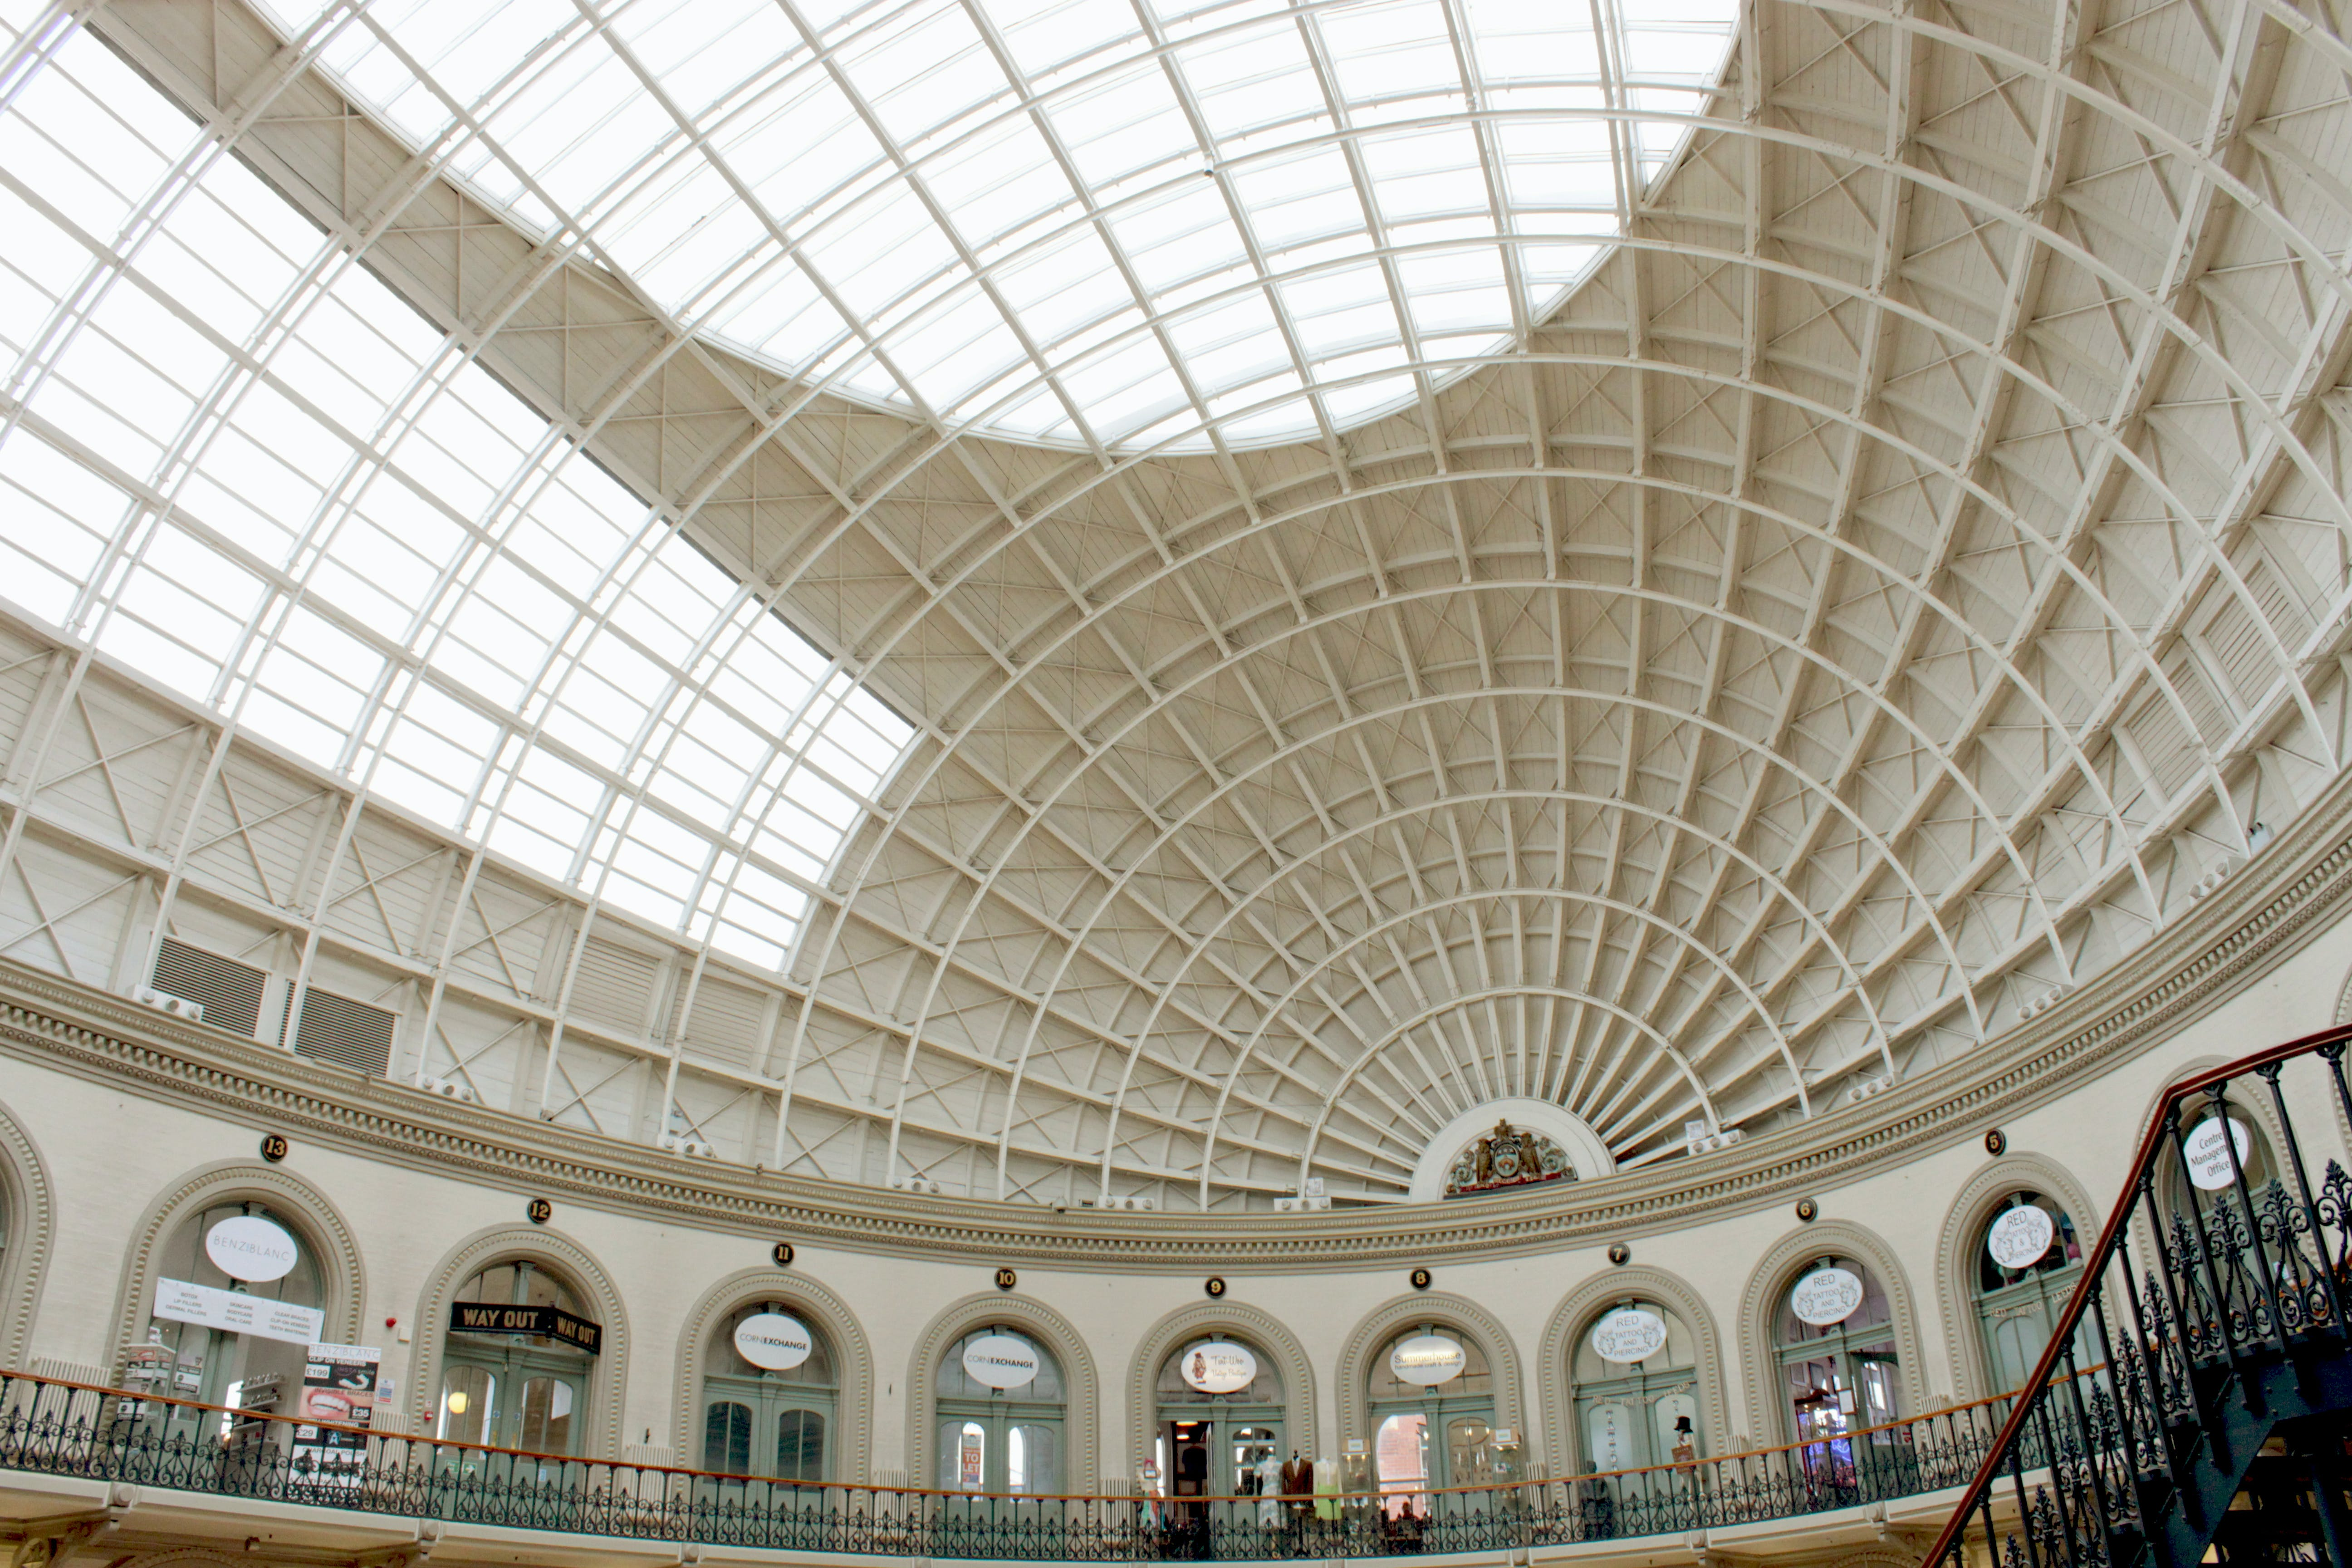 1864, architectural design, art